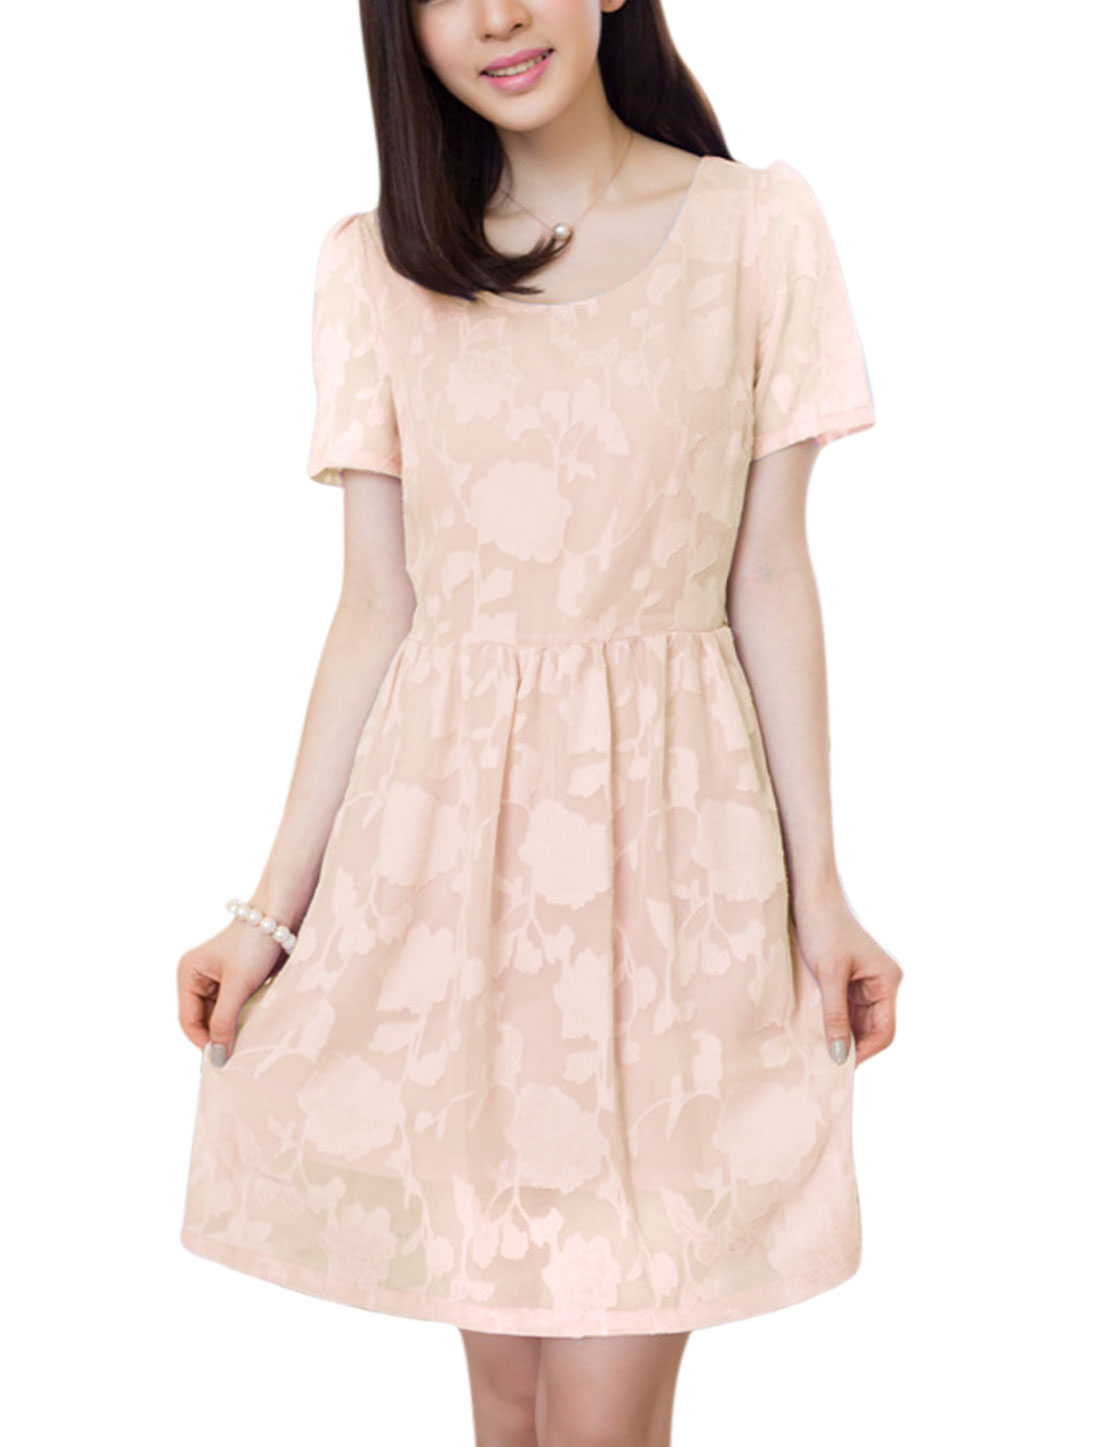 Ladies Flower Textured Design Pleated Detail Chiffon Dress Light Pink M